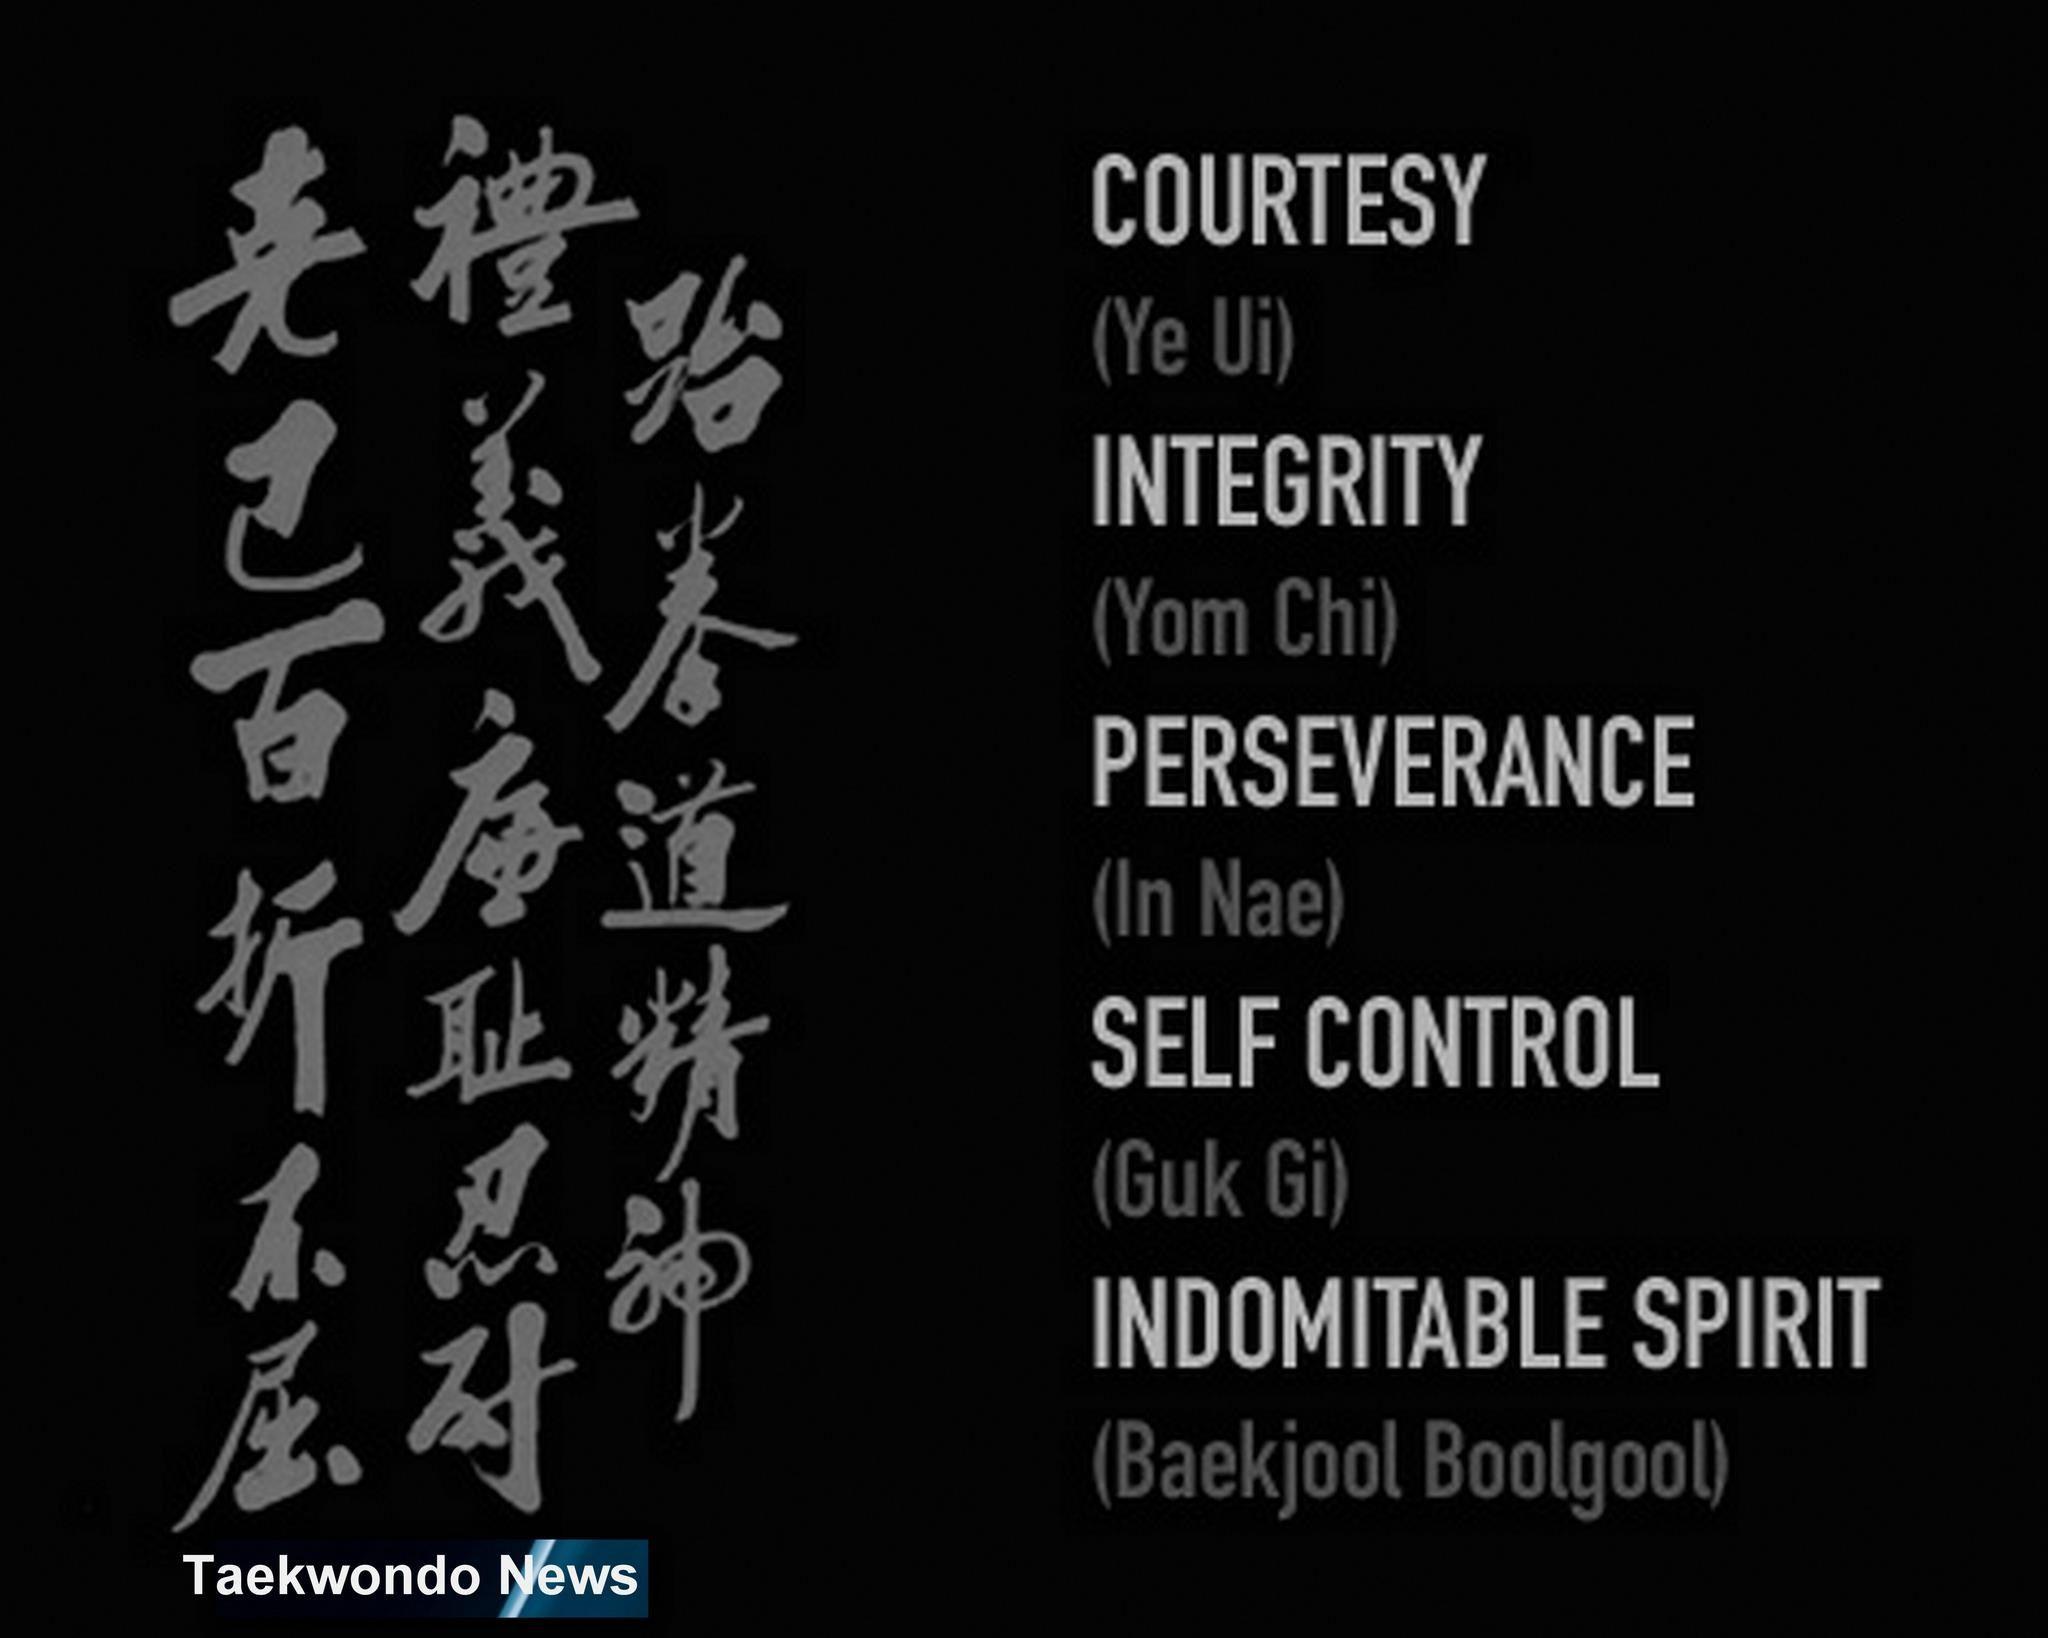 Taekwondo Quotes Tenets Of Taekwondo  Martial Arts  Pinterest  Martial And